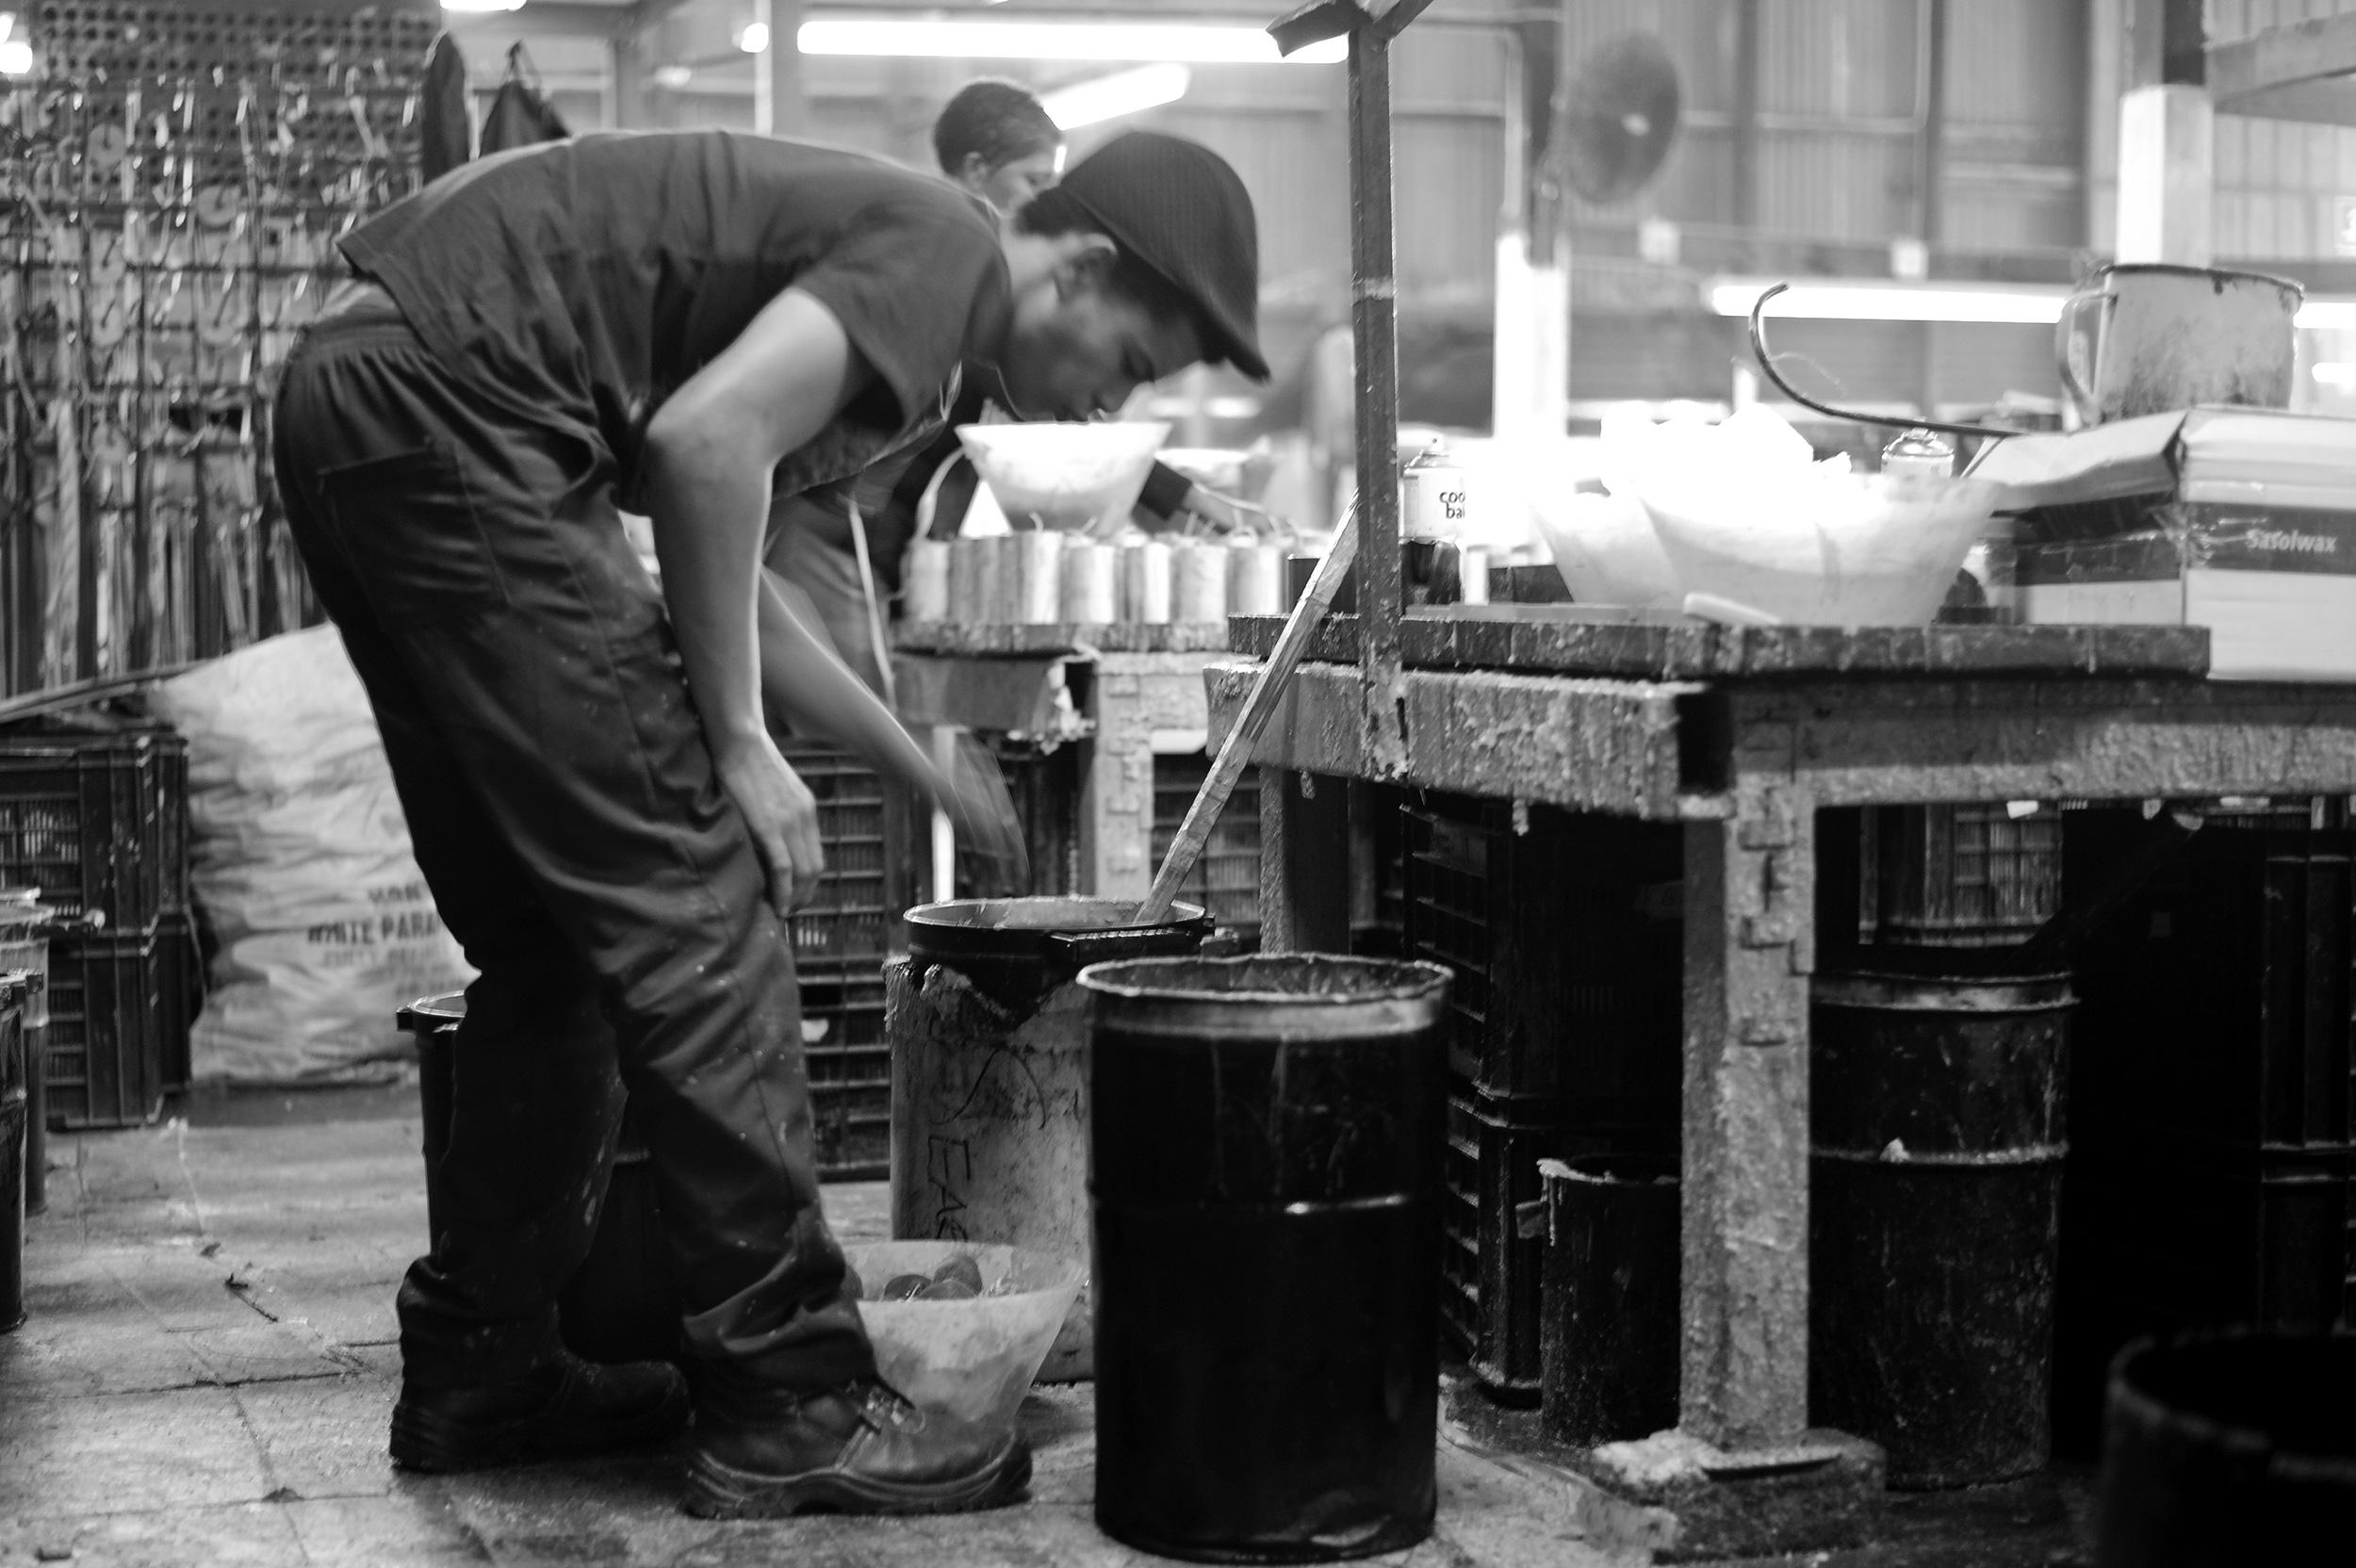 kapula-handmade-filled-ceramic-candles-process-factory.jpg